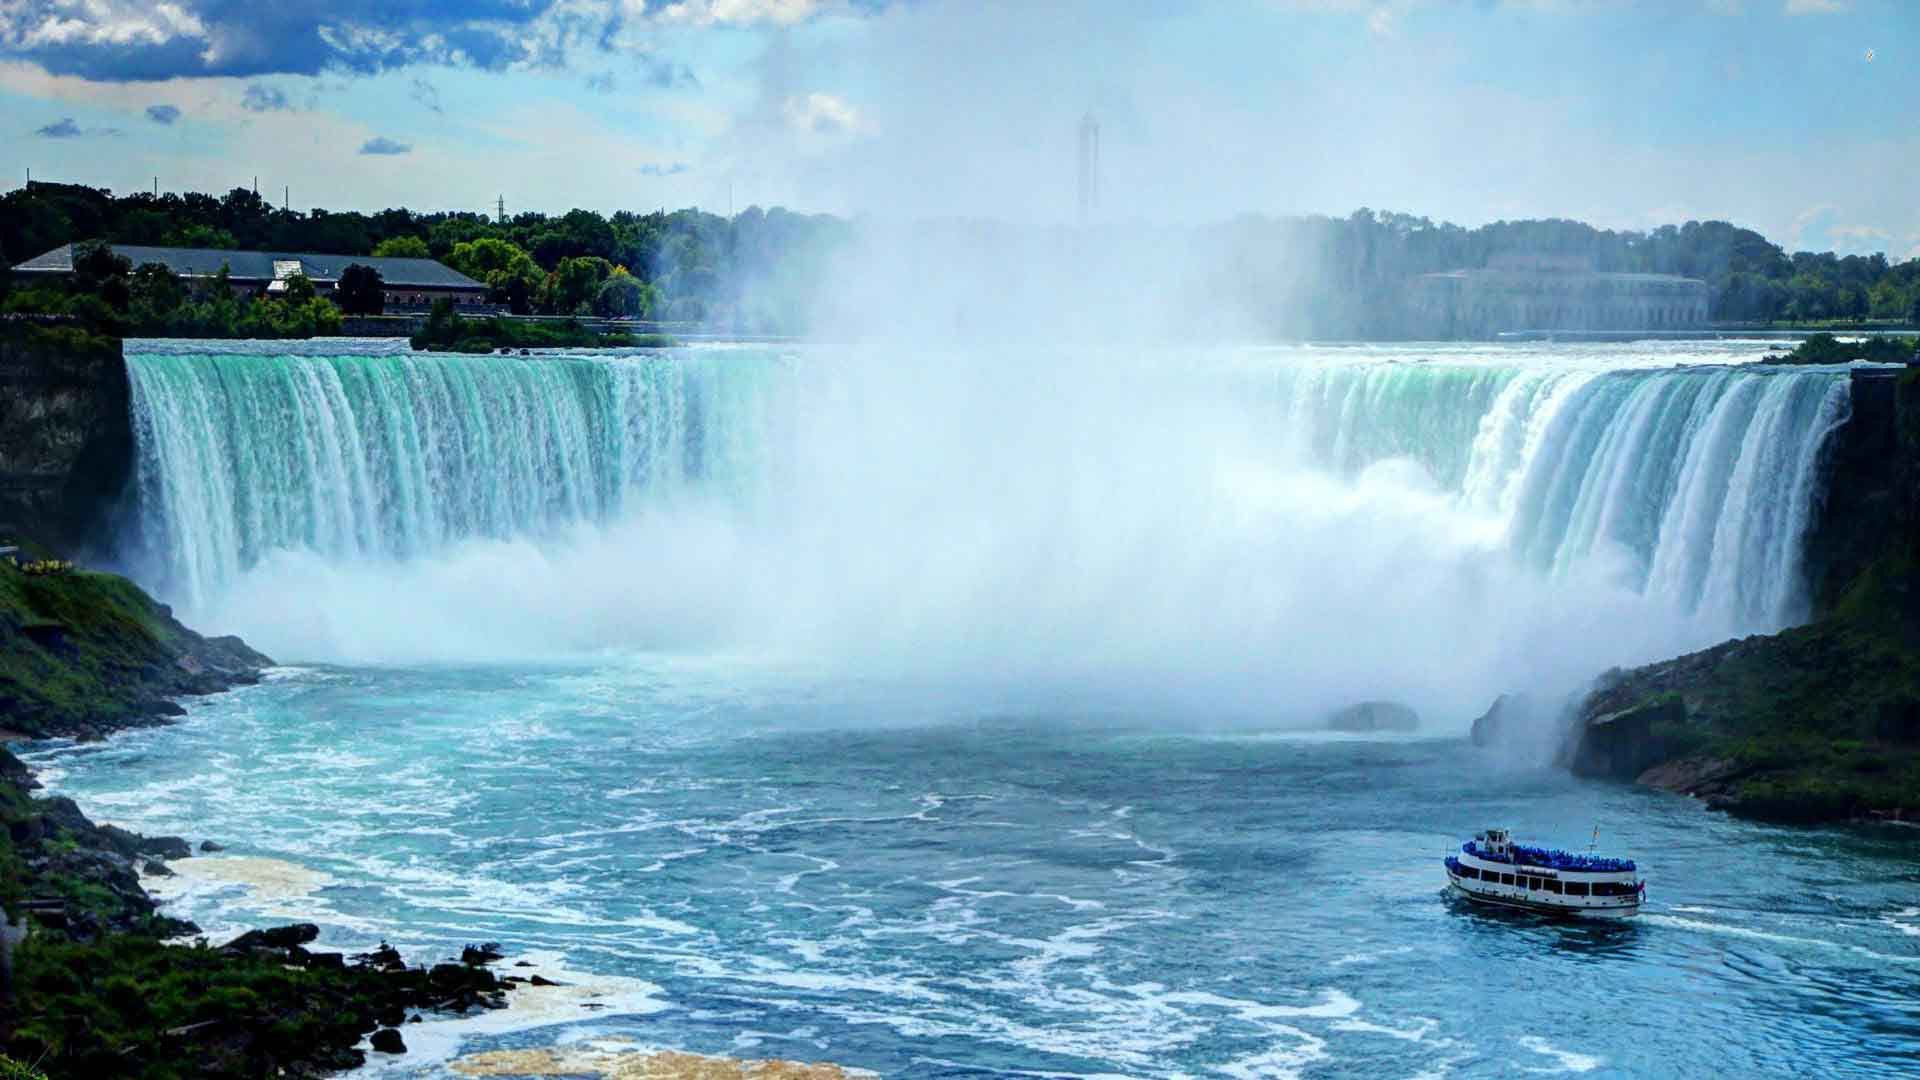 Niagara Falls Computer Wallpaper